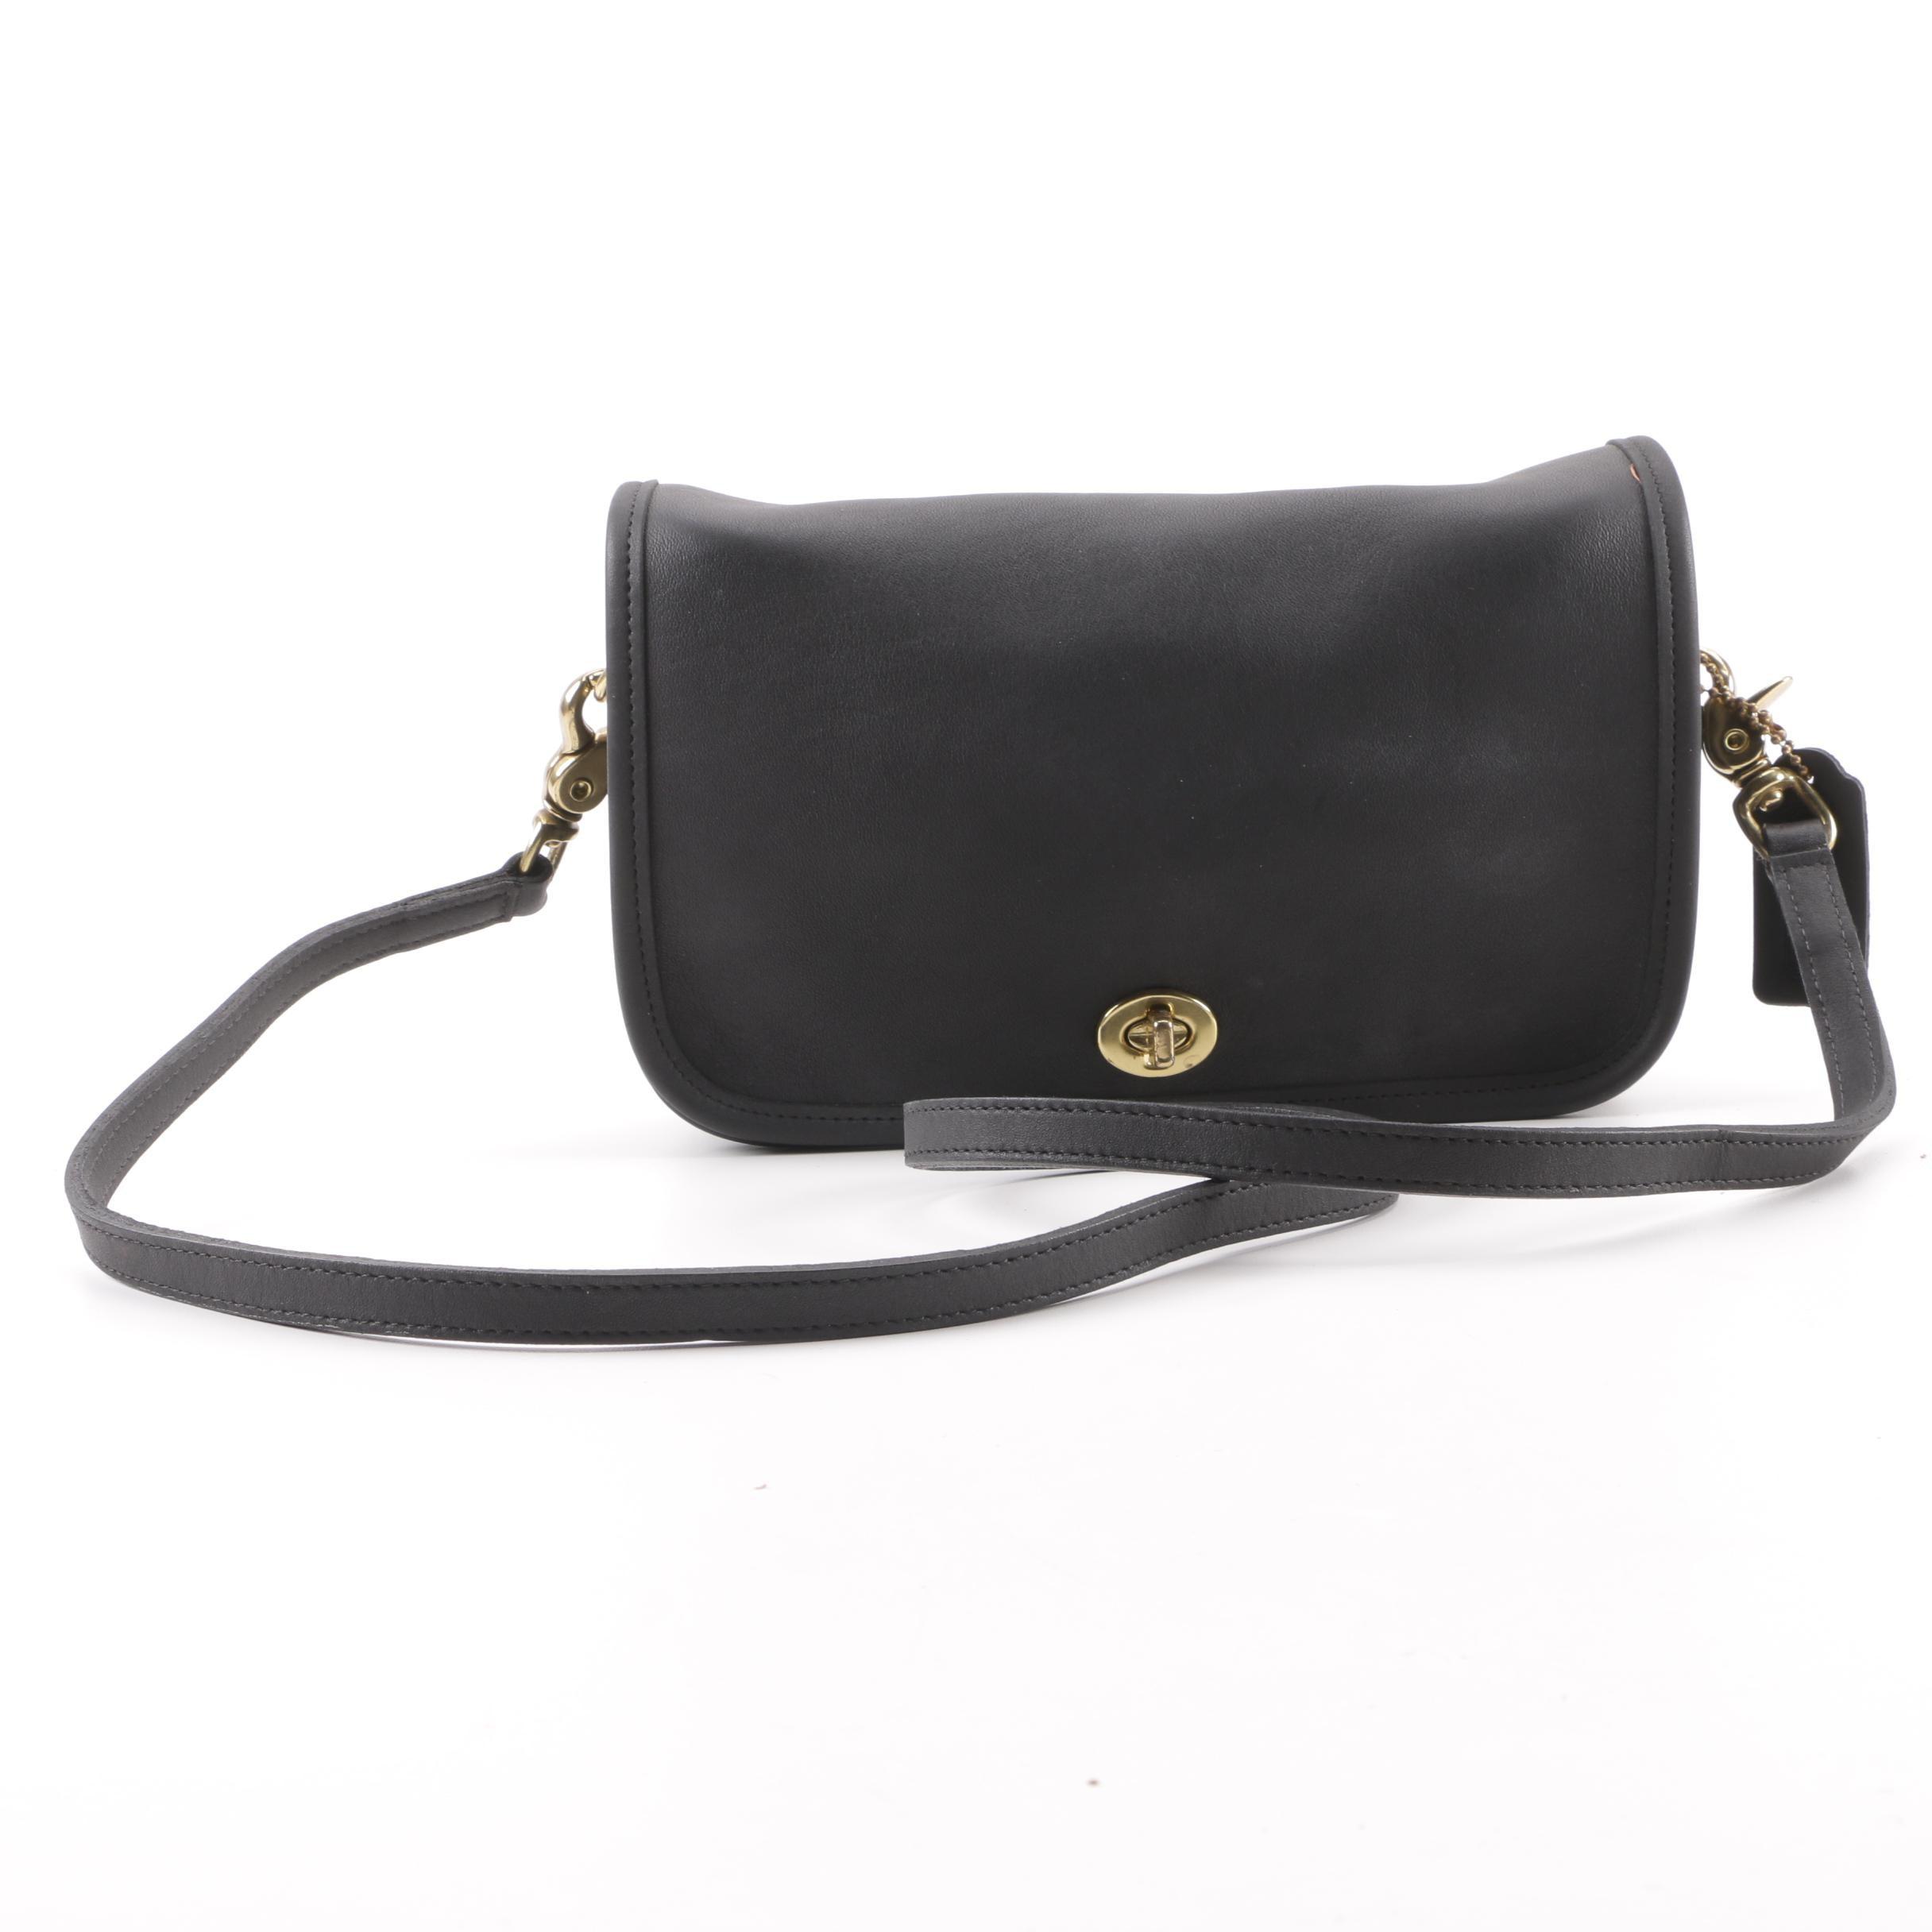 1980s Vintage Coach Black Leather Flap Front Baguette Shoulder Bag